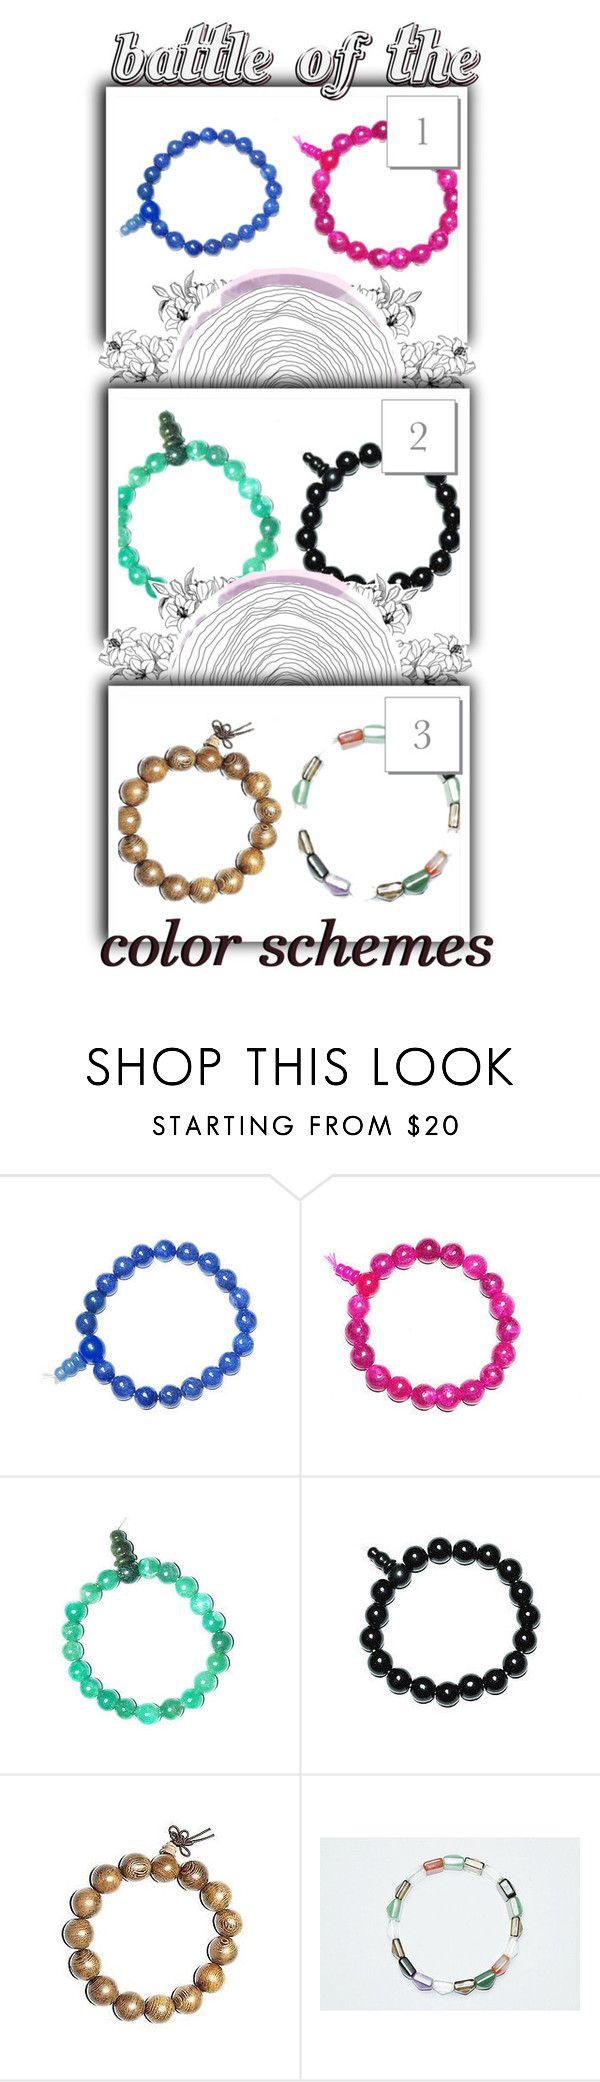 Boho Meditation Wrist Bracelet by baydeals on Polyvore featuring bracelet and wristBracelet  http://stores.ebay.com/mogulgallery/WOMENS-JEWELRY-/_i.html?_fsub=685596419&_sid=3781319&_trksid=p4634.c0.m322